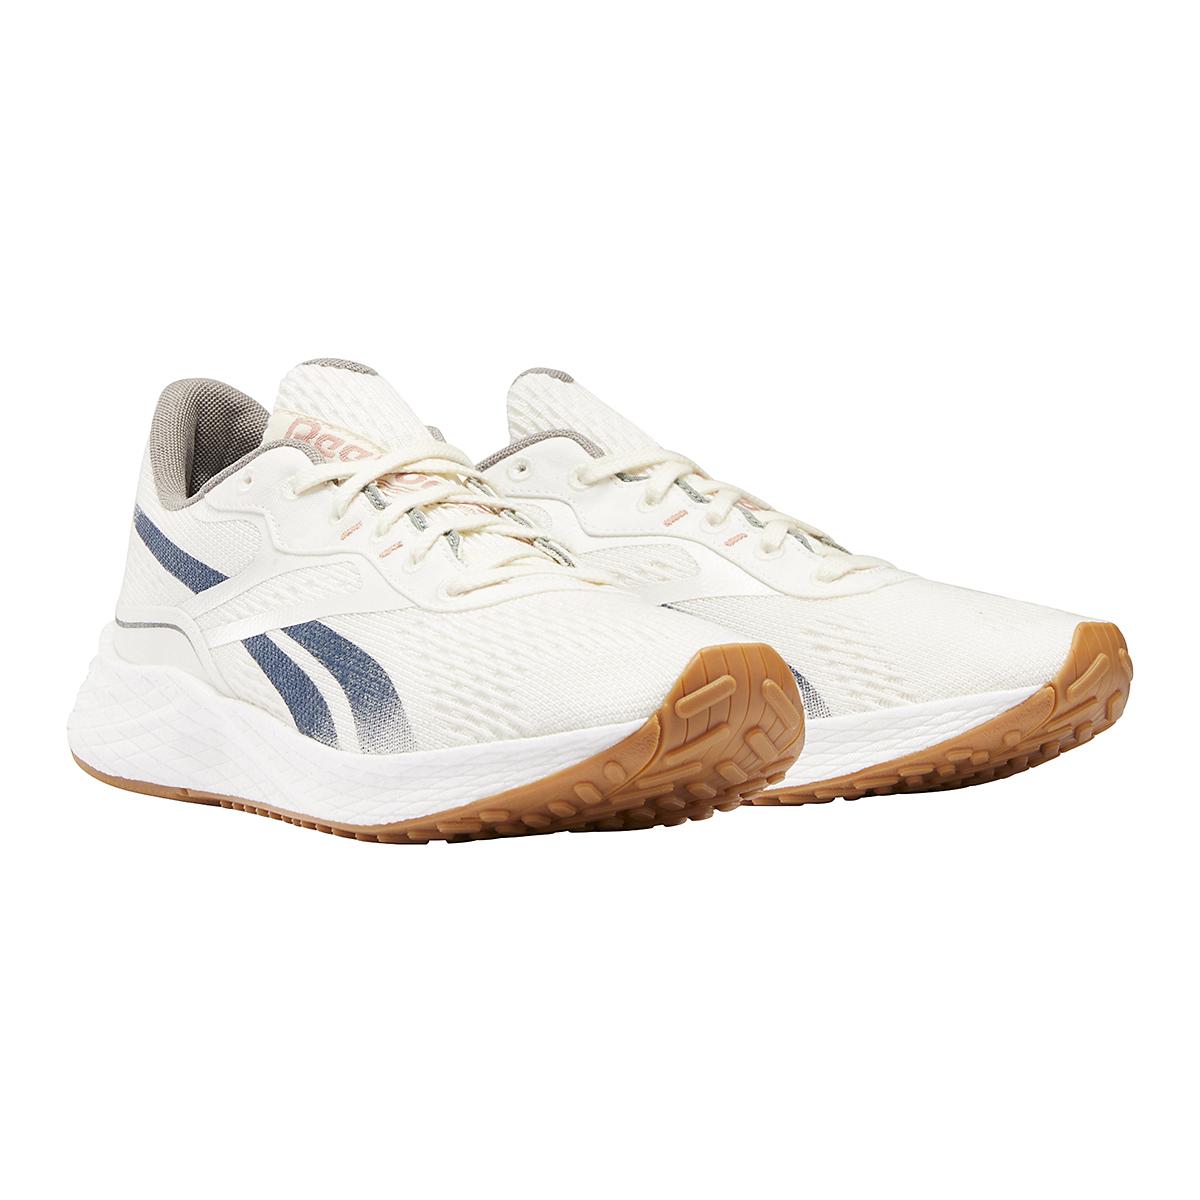 Men's Reebok Floatride Energy Grow Running Shoe - Color: Classic White/Brave Blue/Boulder Grey - Size: 7 - Width: Regular, Classic White/Brave Blue/Boulder Grey, large, image 3